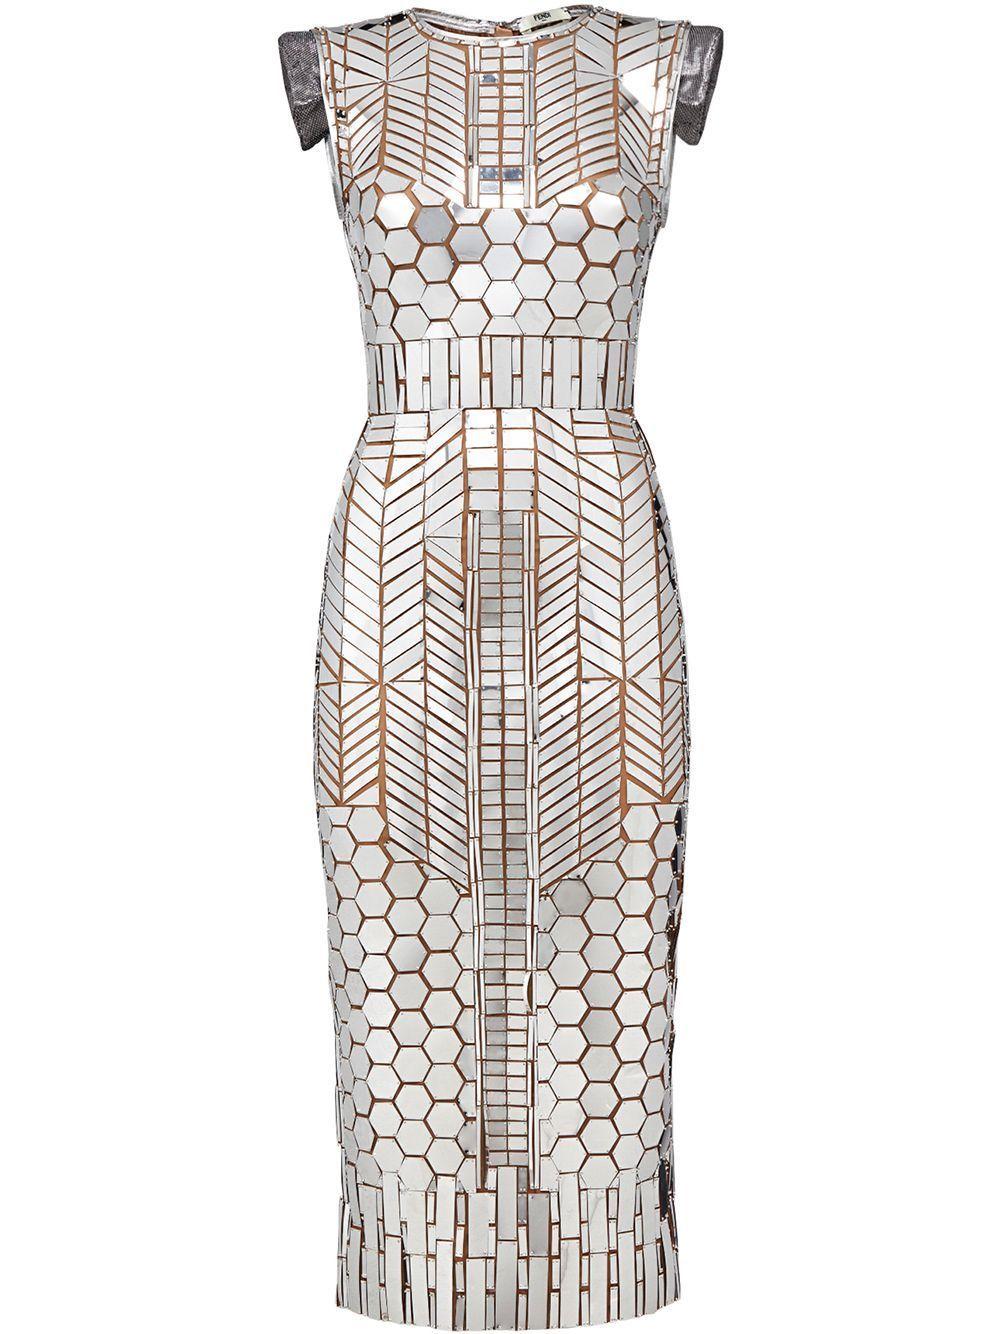 Fendi Fendi Prints On Mirror Patch Dress Metallic Dress Fendi Metallic Mirrorpatch Prints Patch Dress Tube Dress Designer Cocktail Dress [ 1334 x 1000 Pixel ]